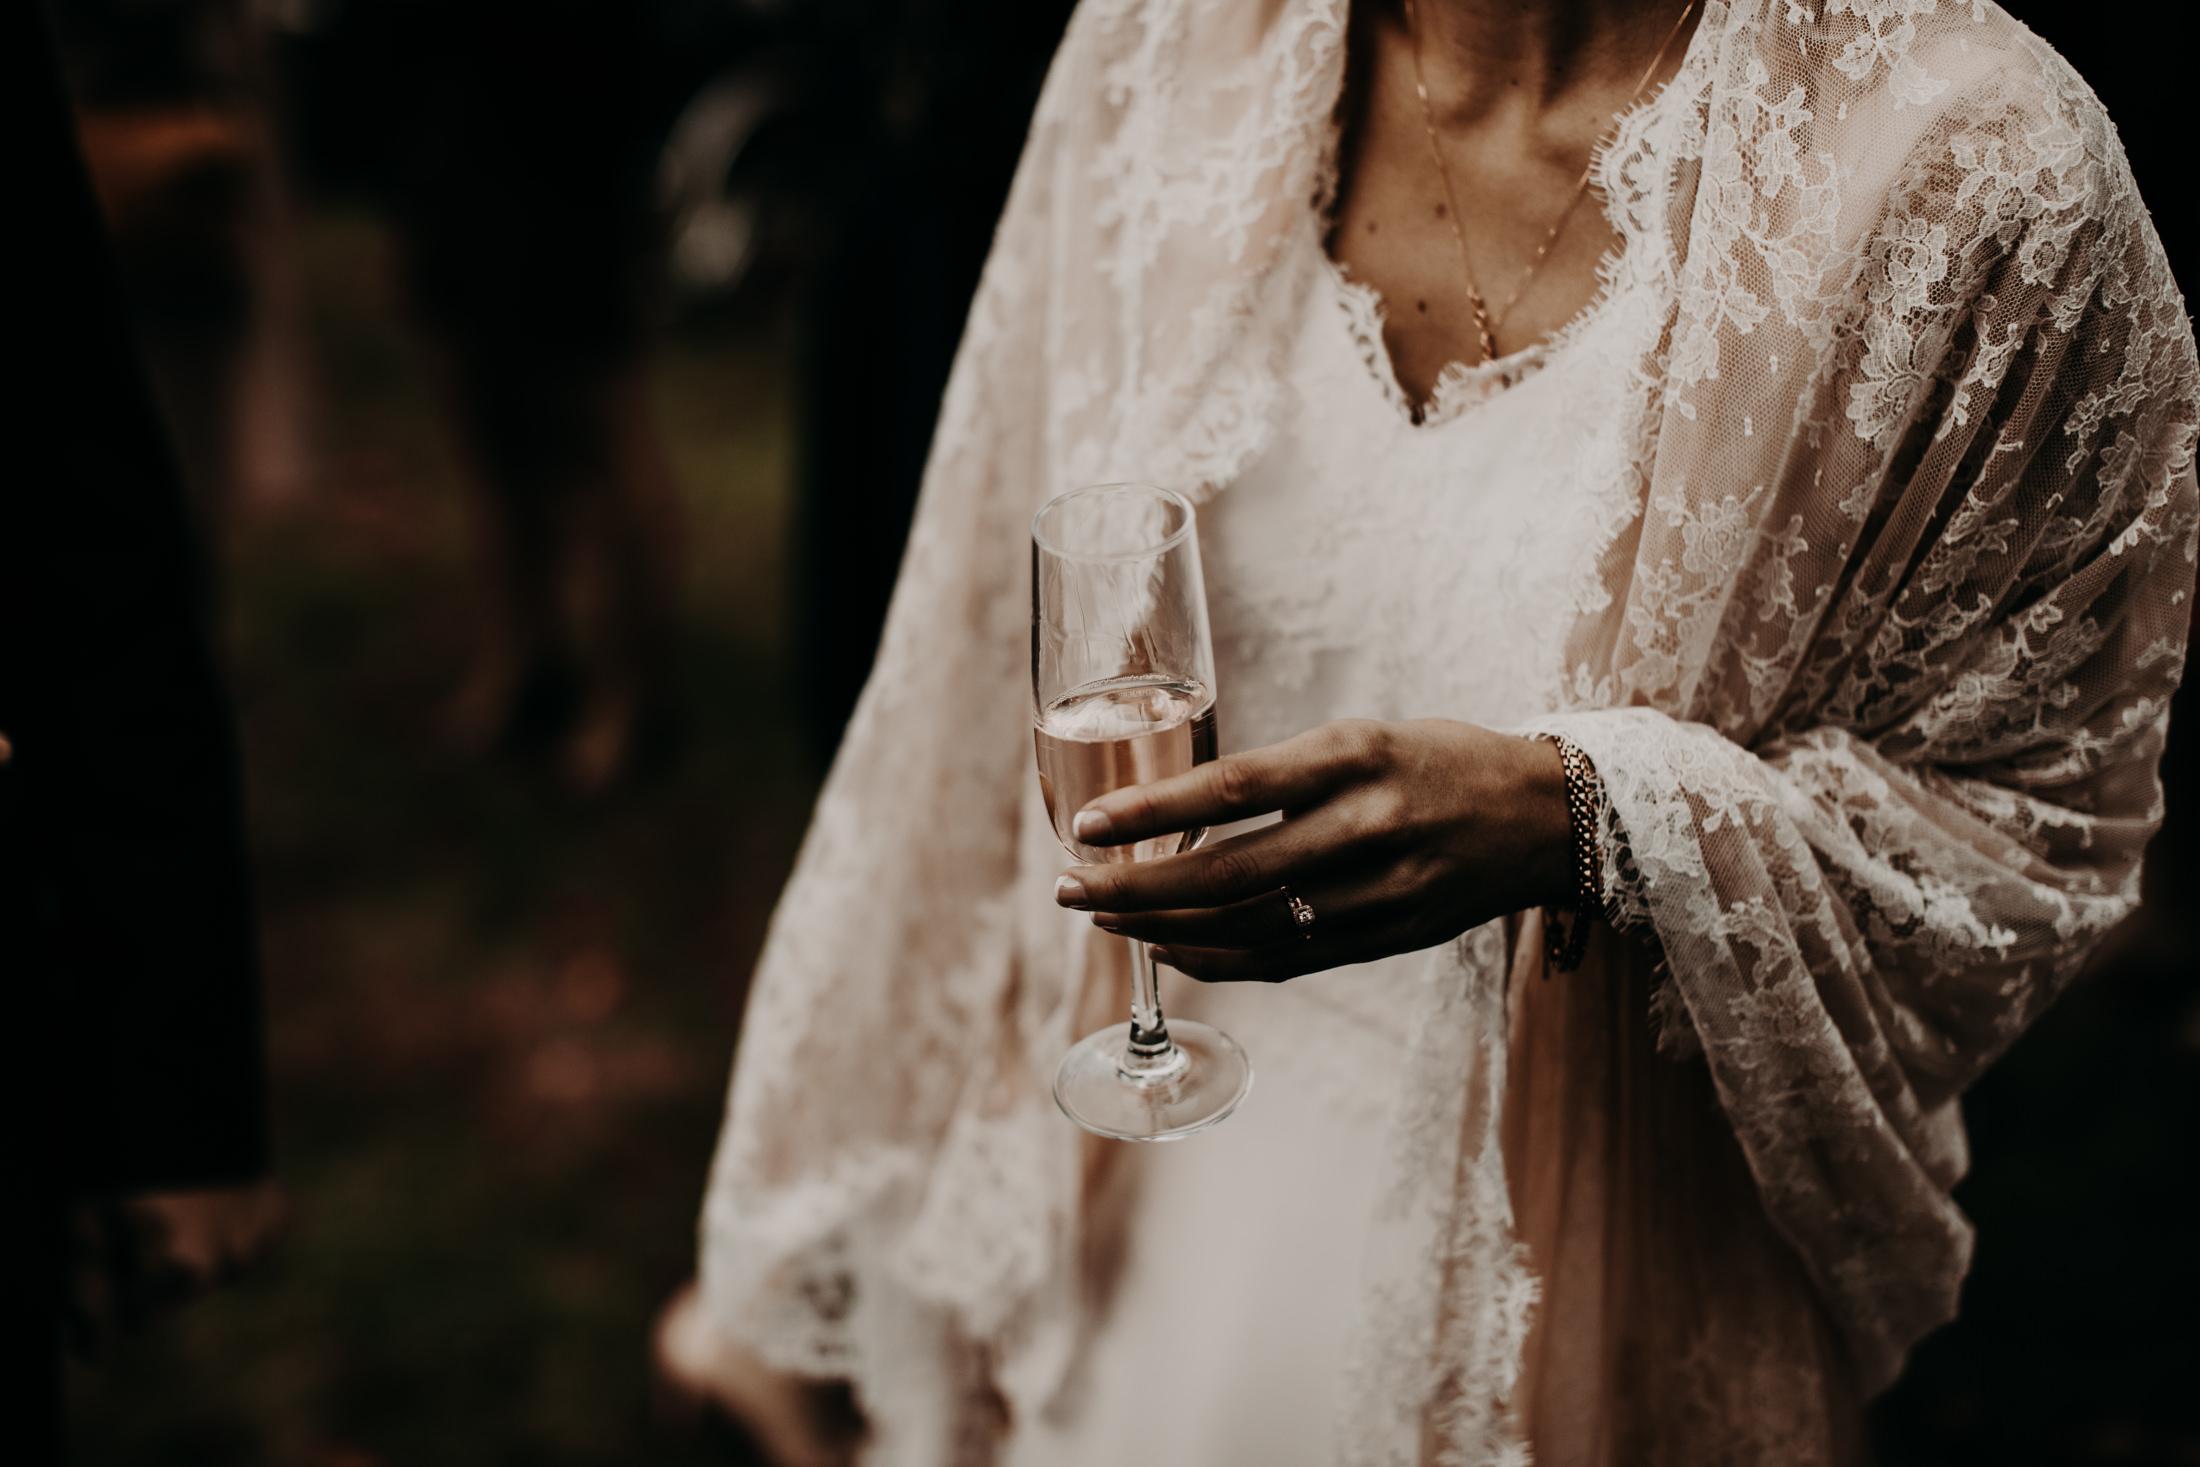 Mariage auvergne photographe wedding_-85.jpg